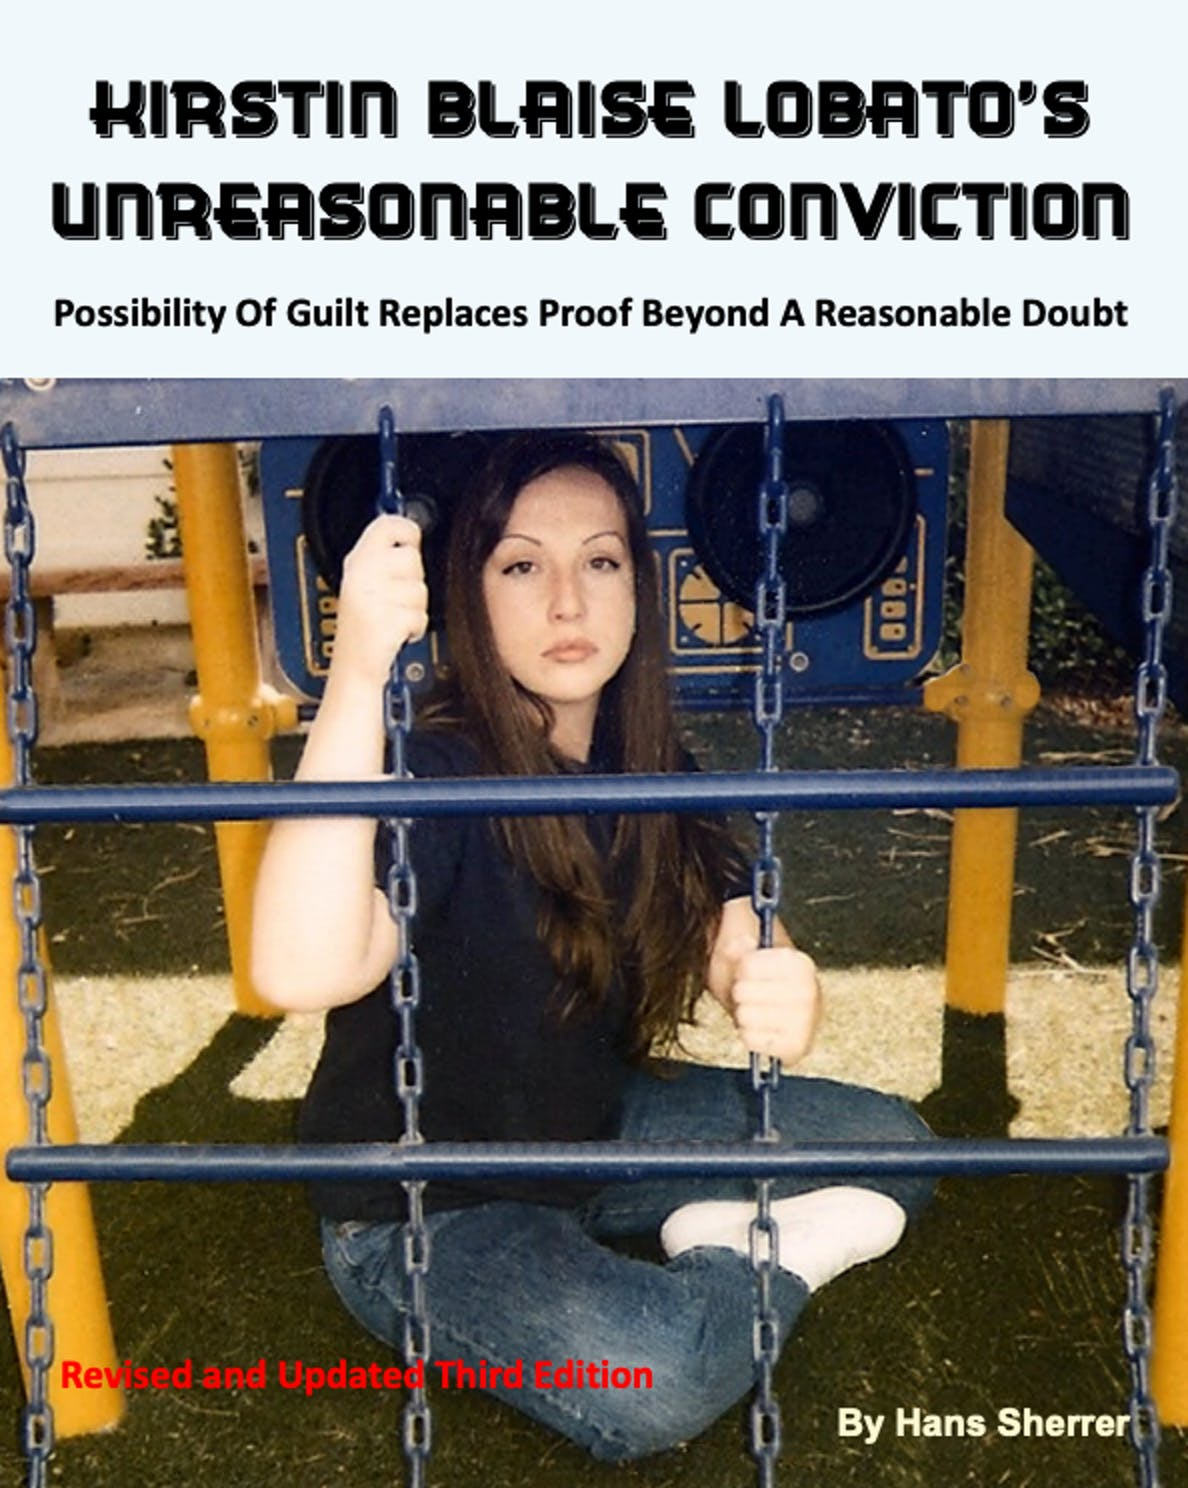 Kirstin Blaise Lobato's Unreasonable Conviction, by Hans Sherrer.